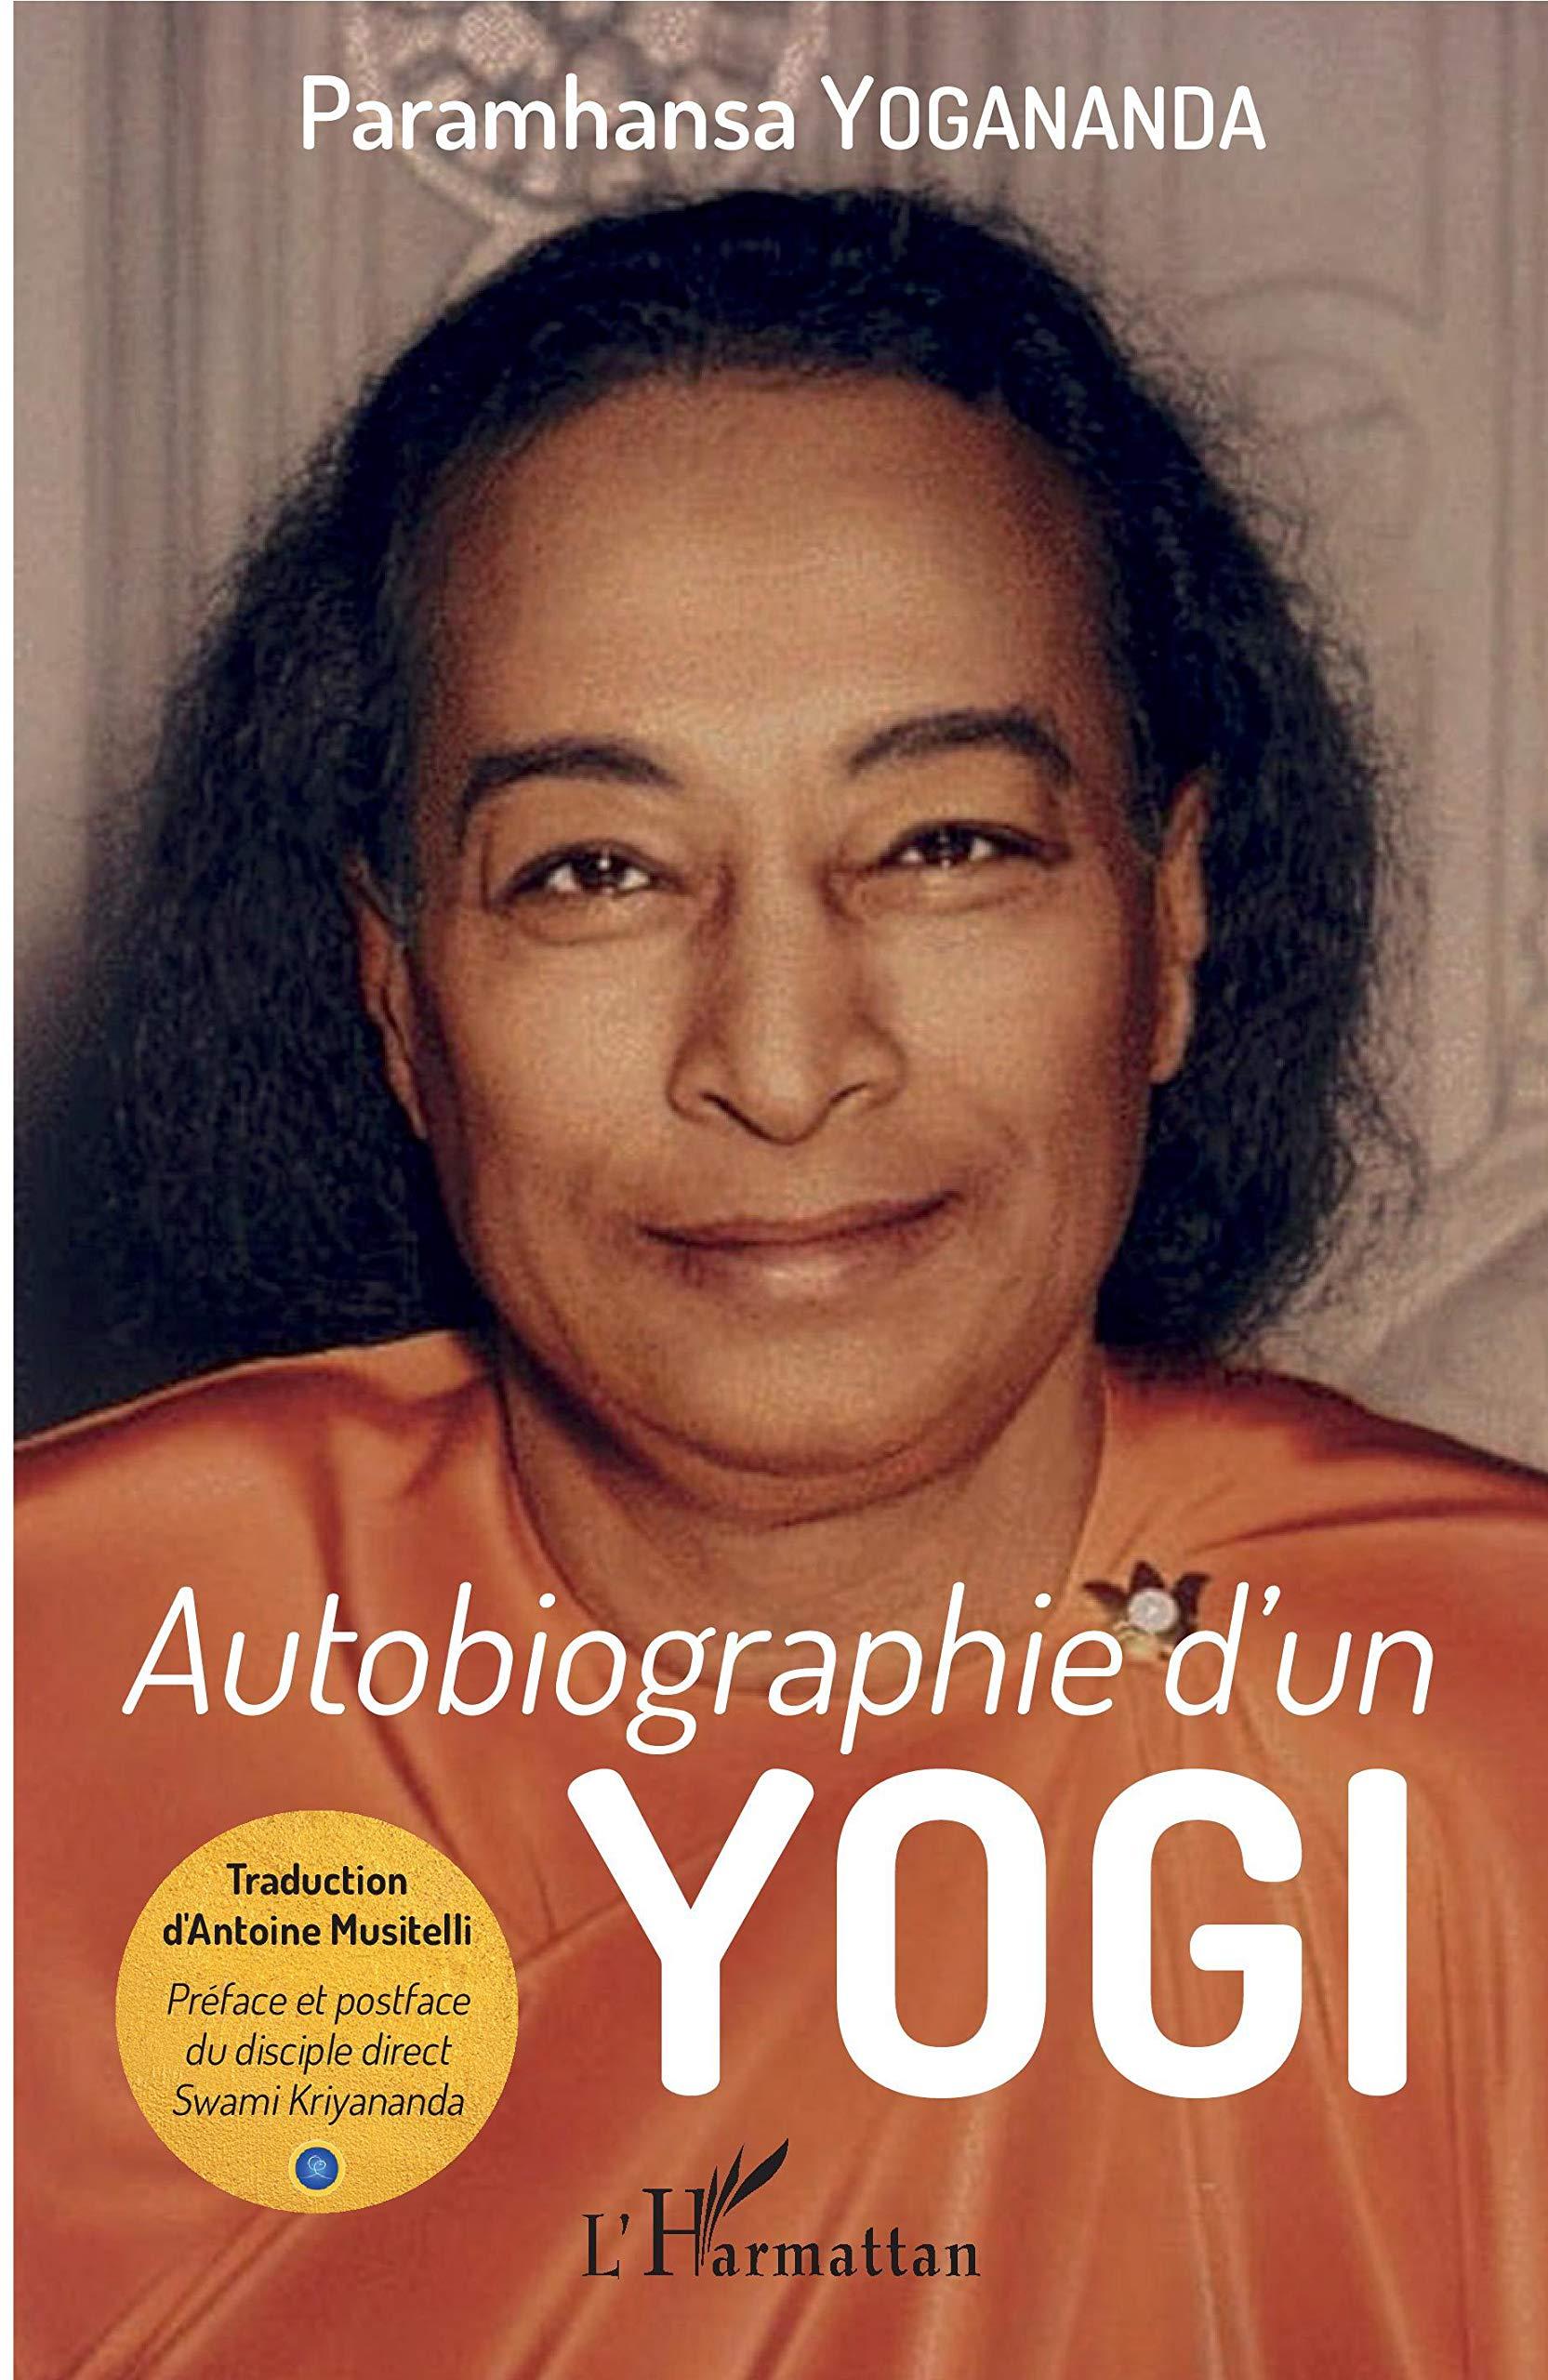 Autobiographie dun yogi: Amazon.es: Paramhansa Yogananda ...